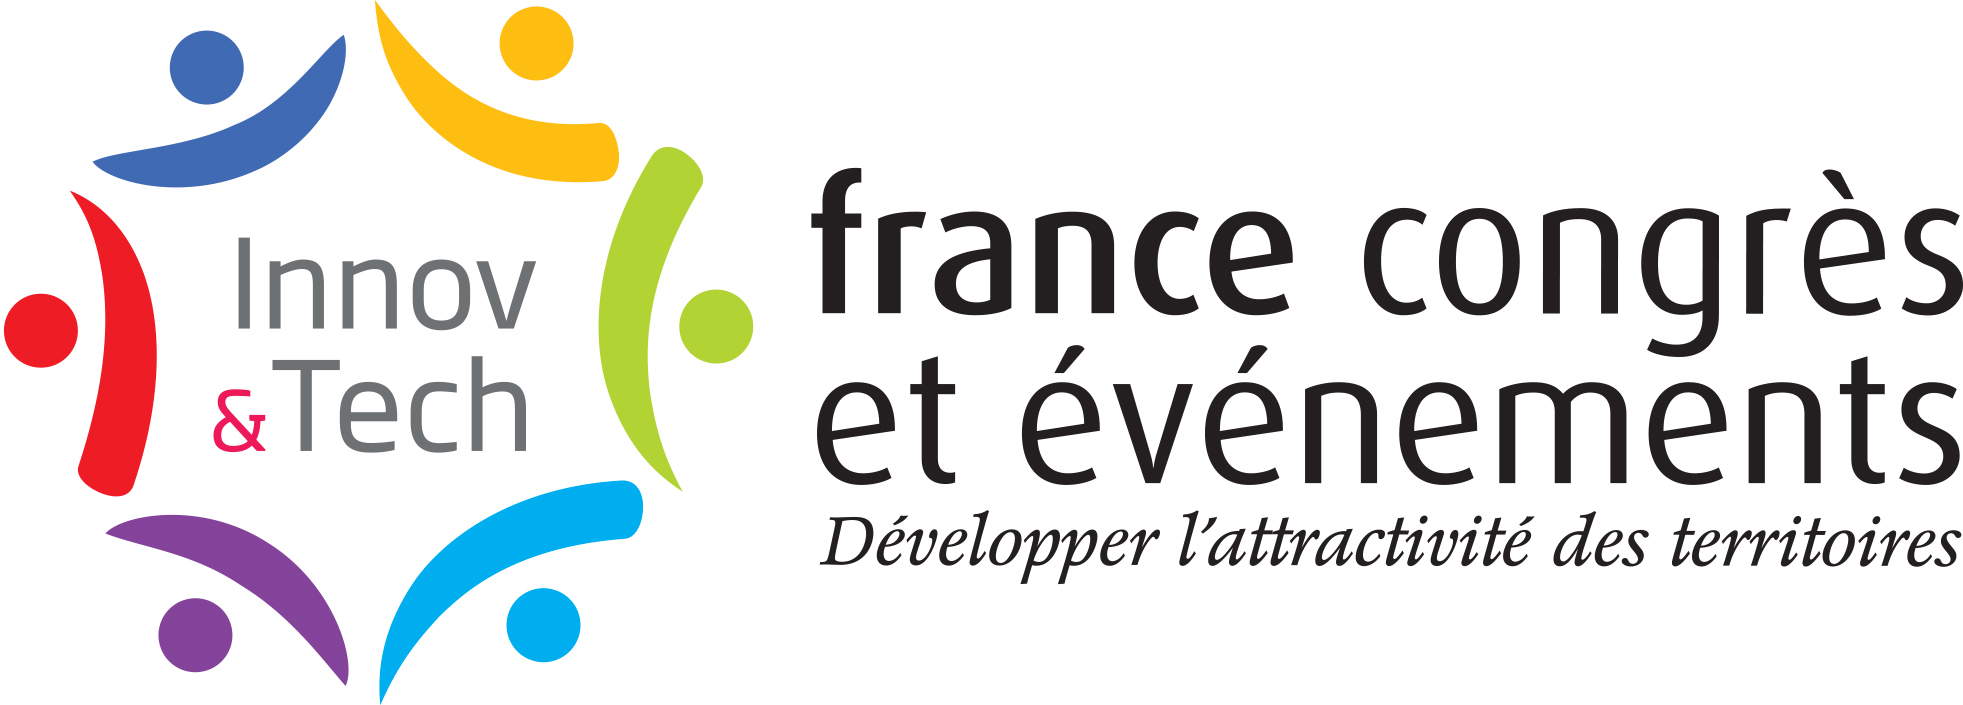 Francecongresnouveaulogo2017cmjnhorizontalinnov1530112474153011247415365757361536575736